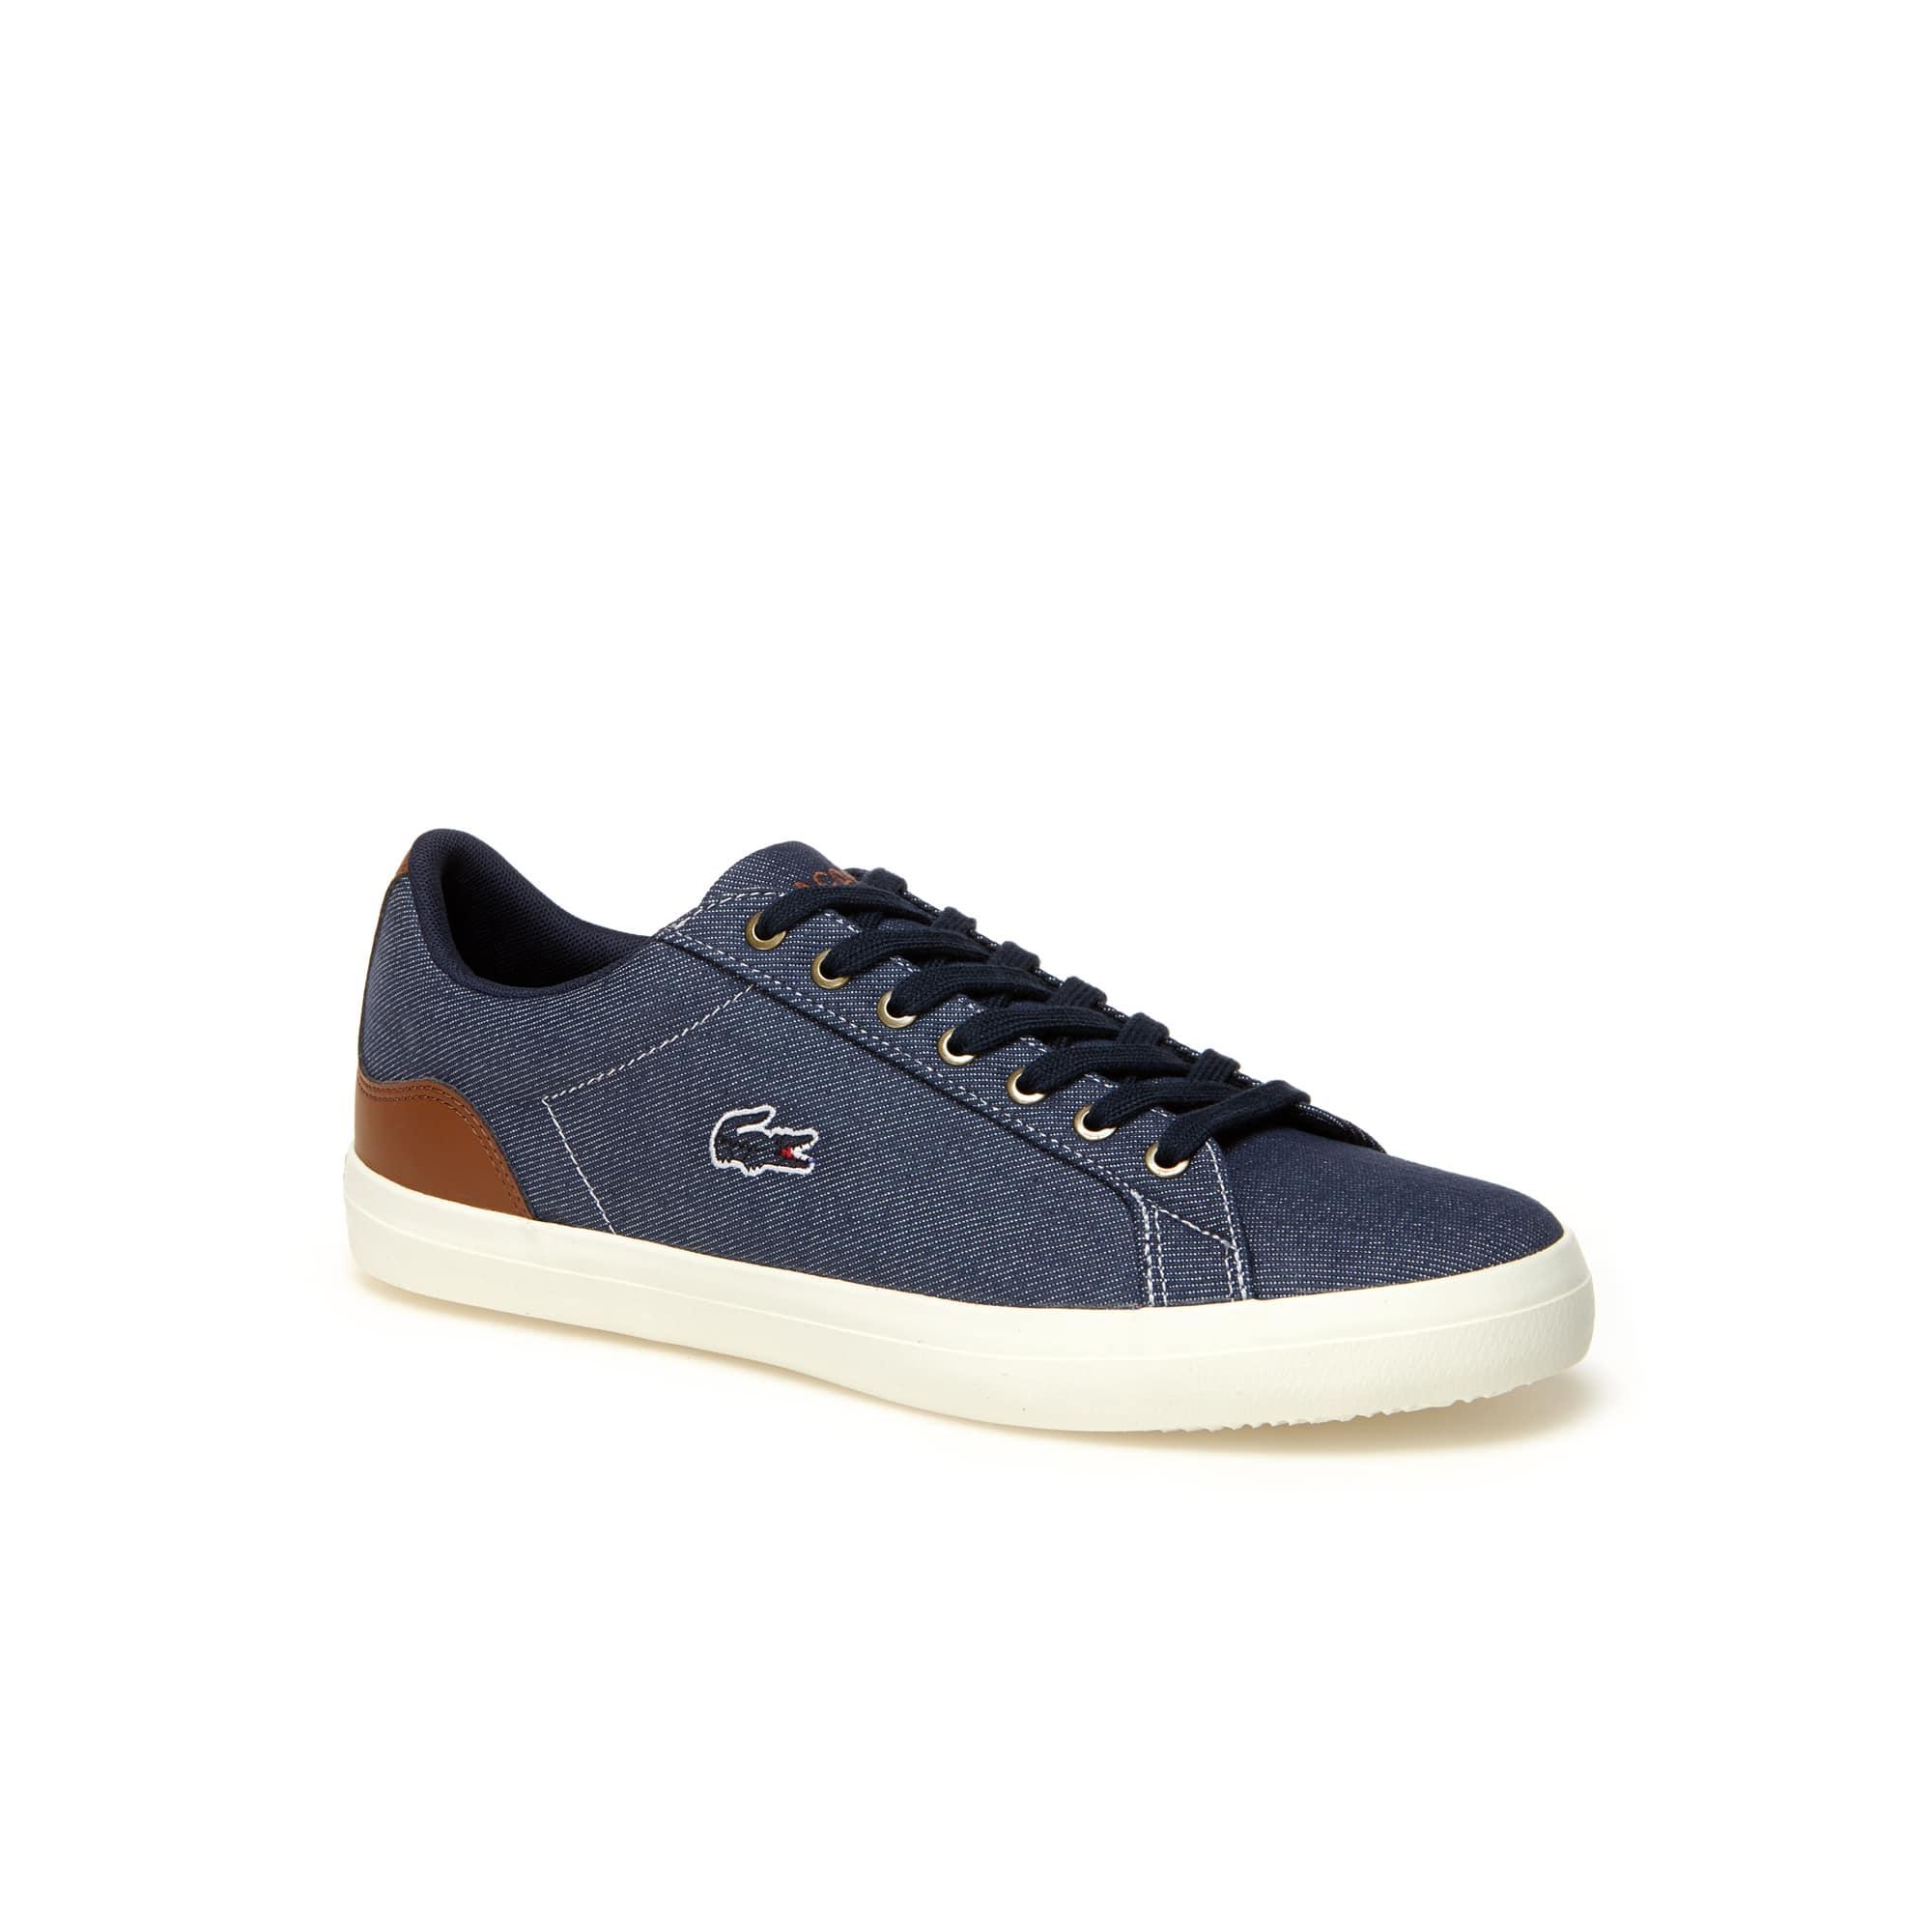 Herren-Sneakers LEROND aus Stoff